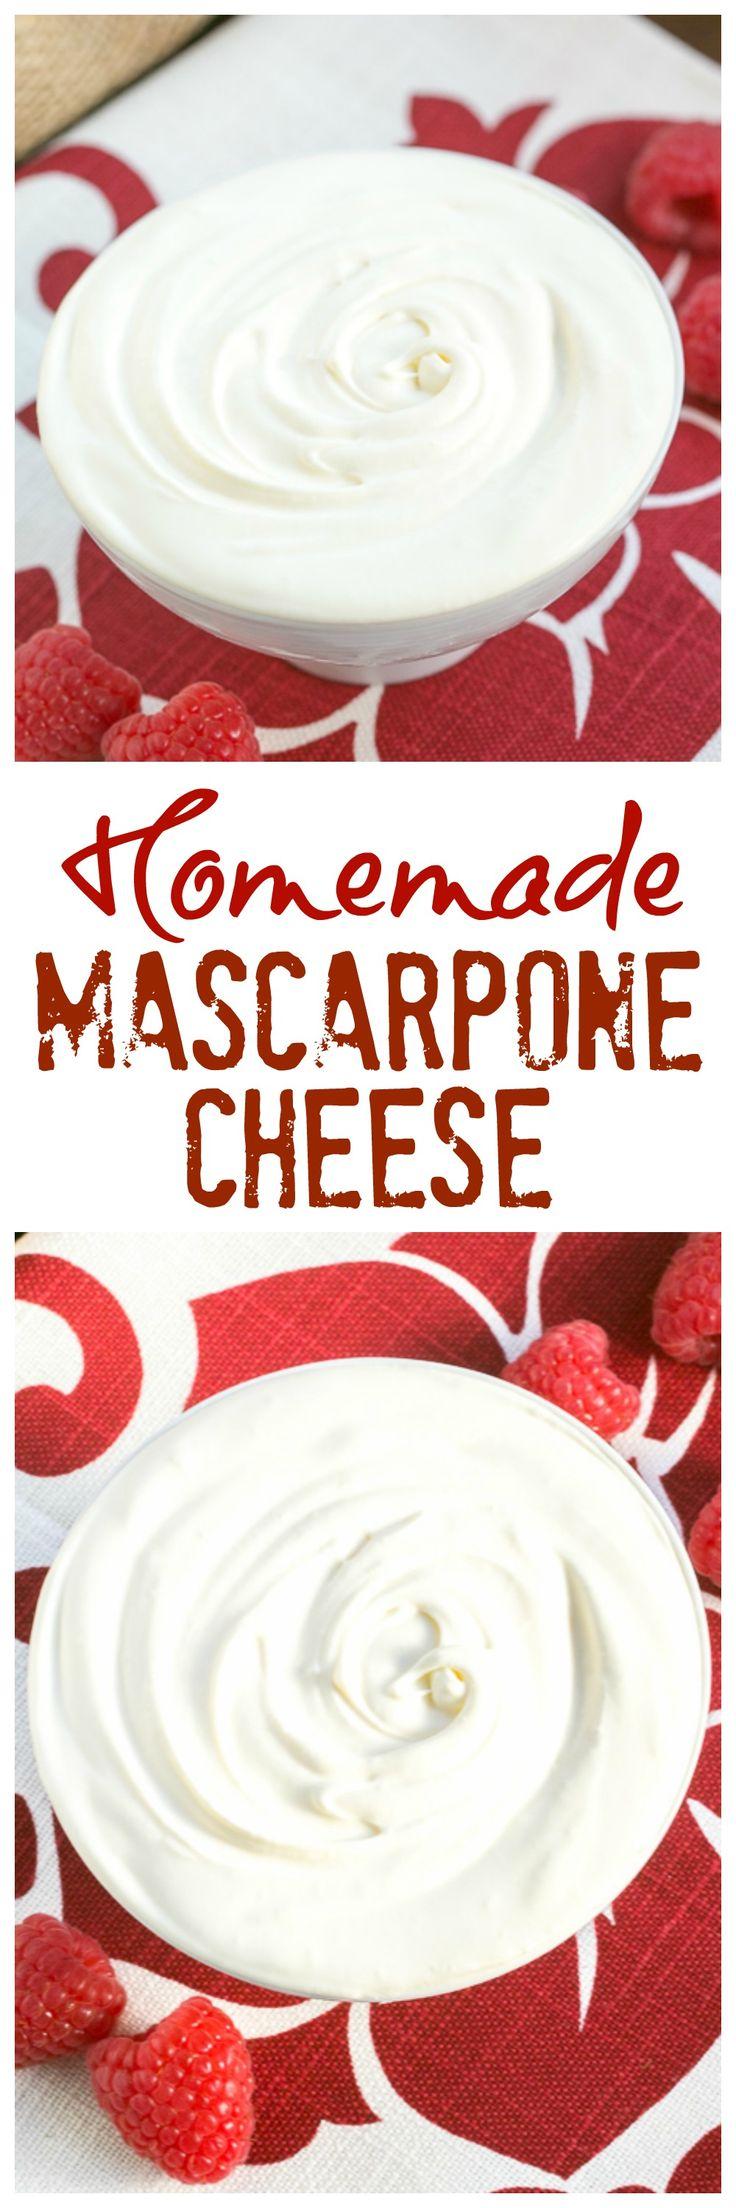 Homemade Mascarpone | How to make mascarpone cheese at home. It's SO easy! @lizzydo